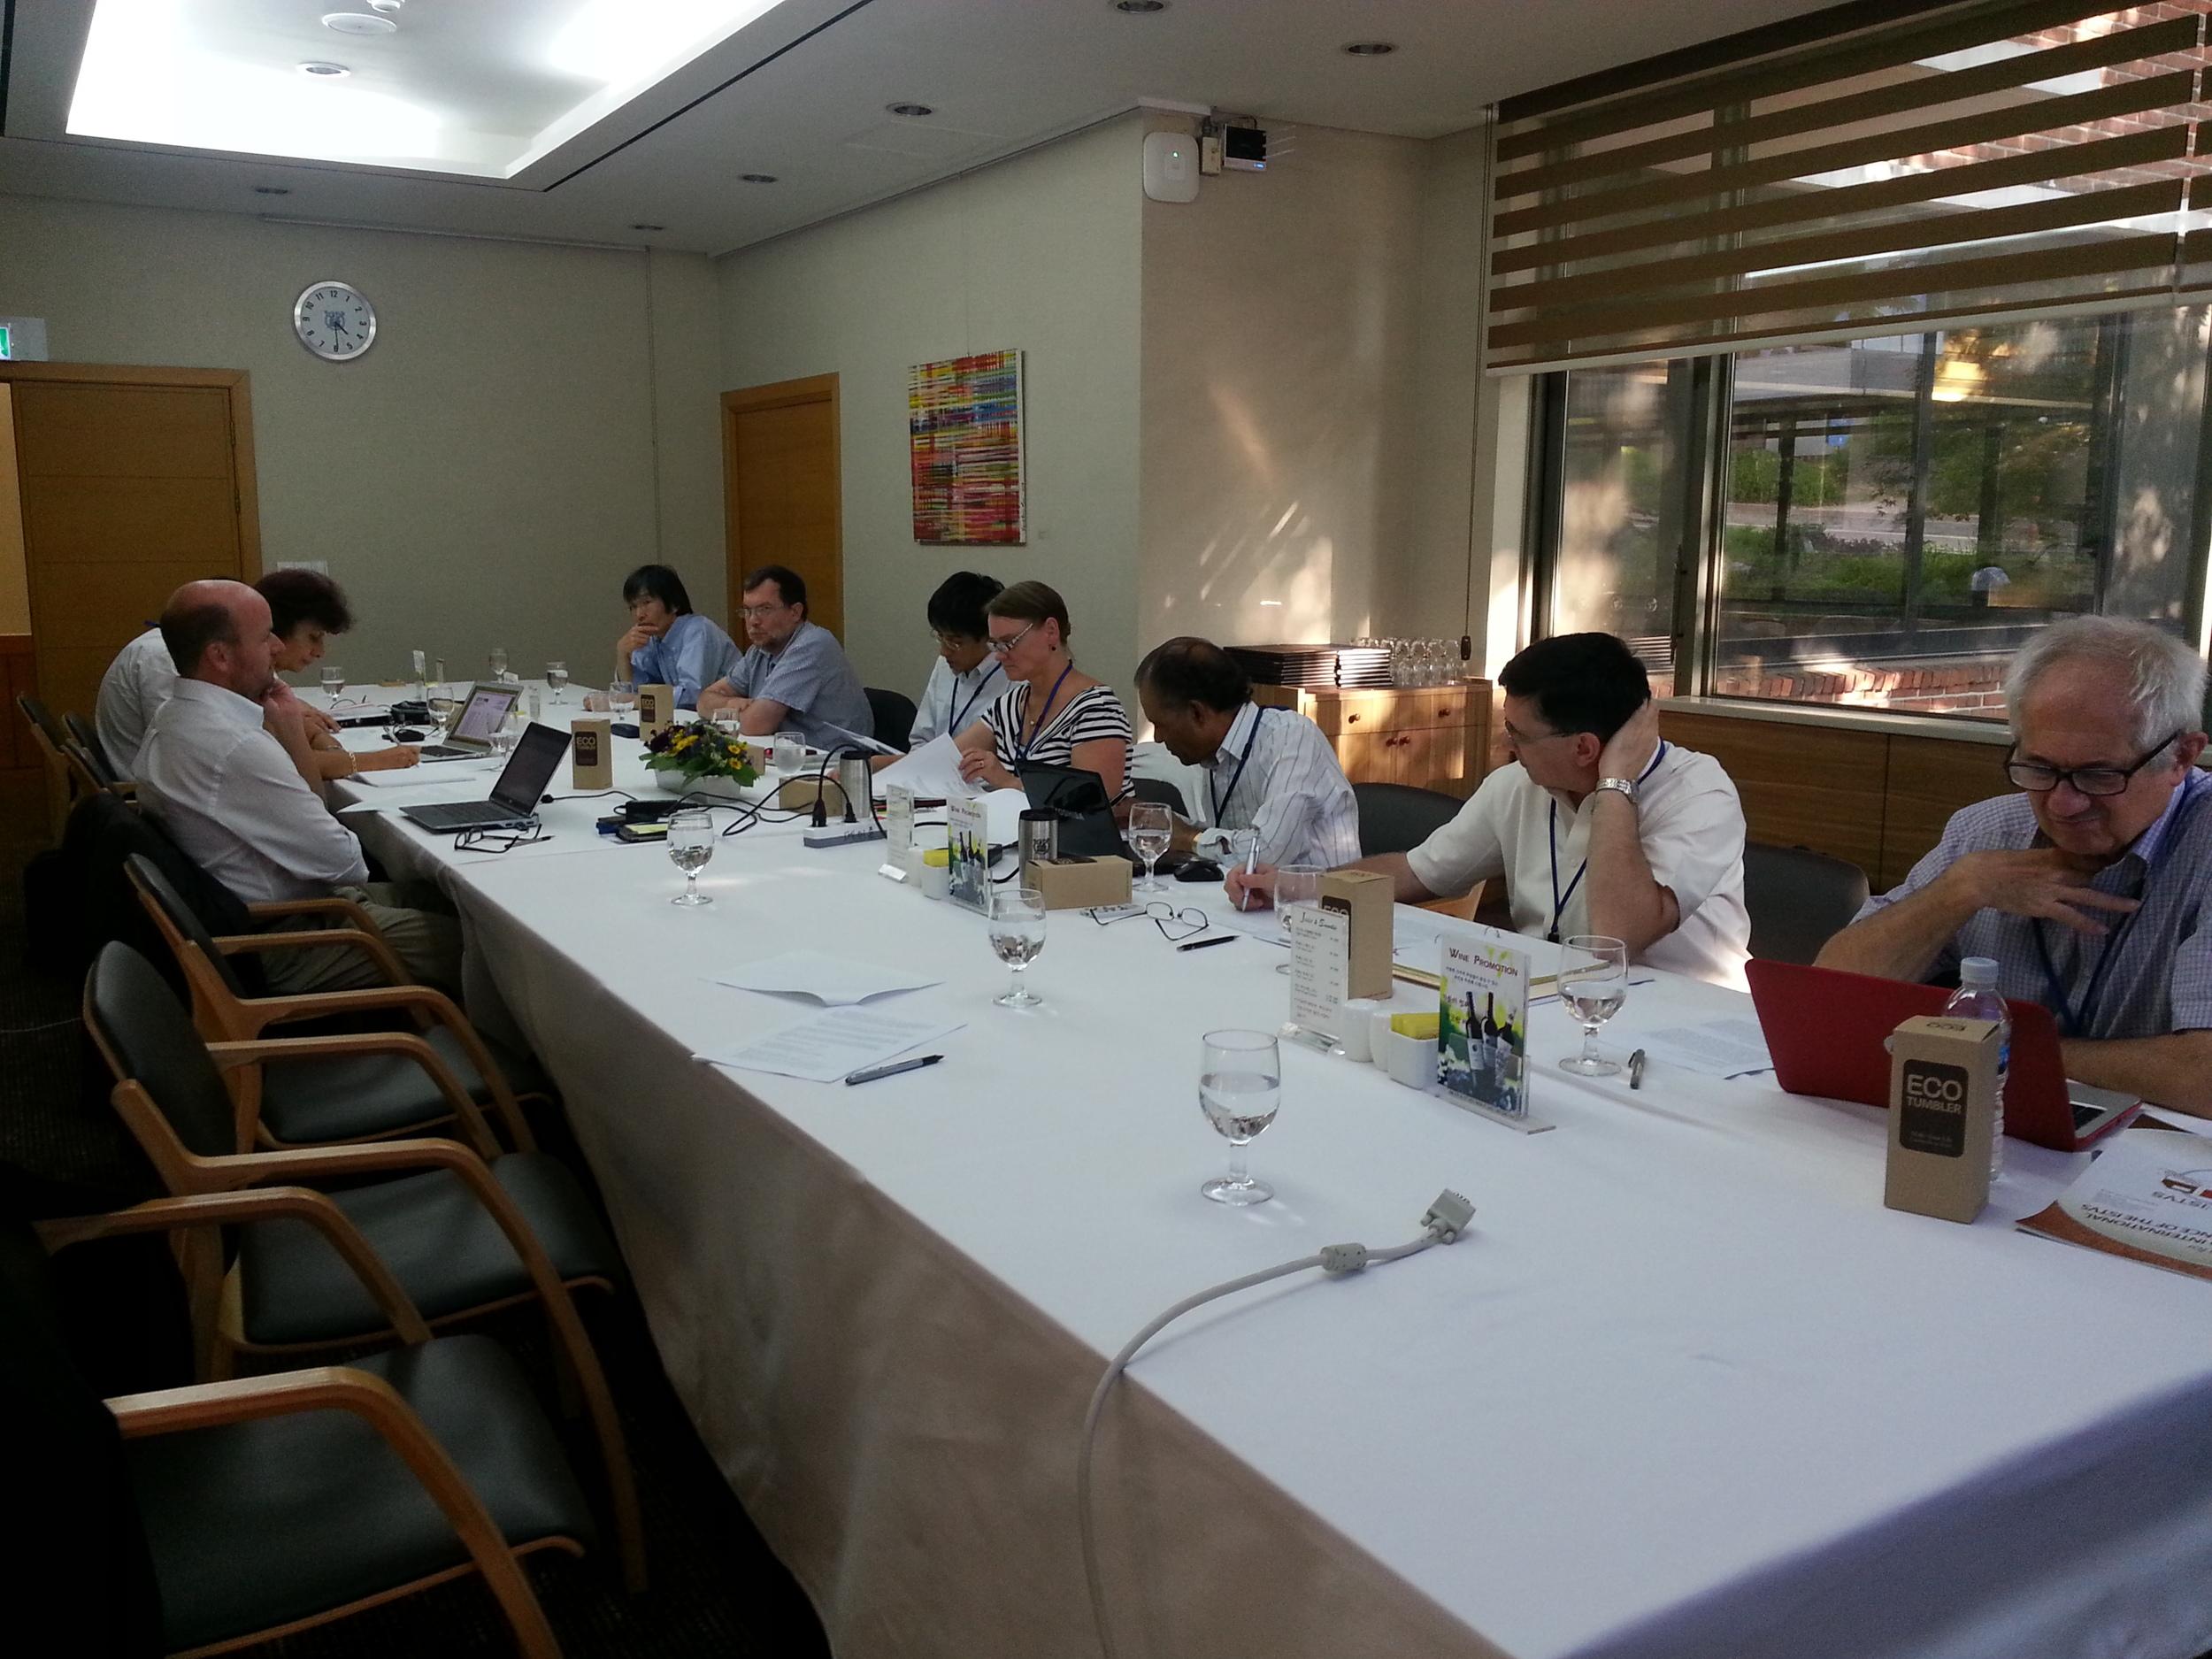 istvs_seoul2014-kim_BoD meeting.jpg